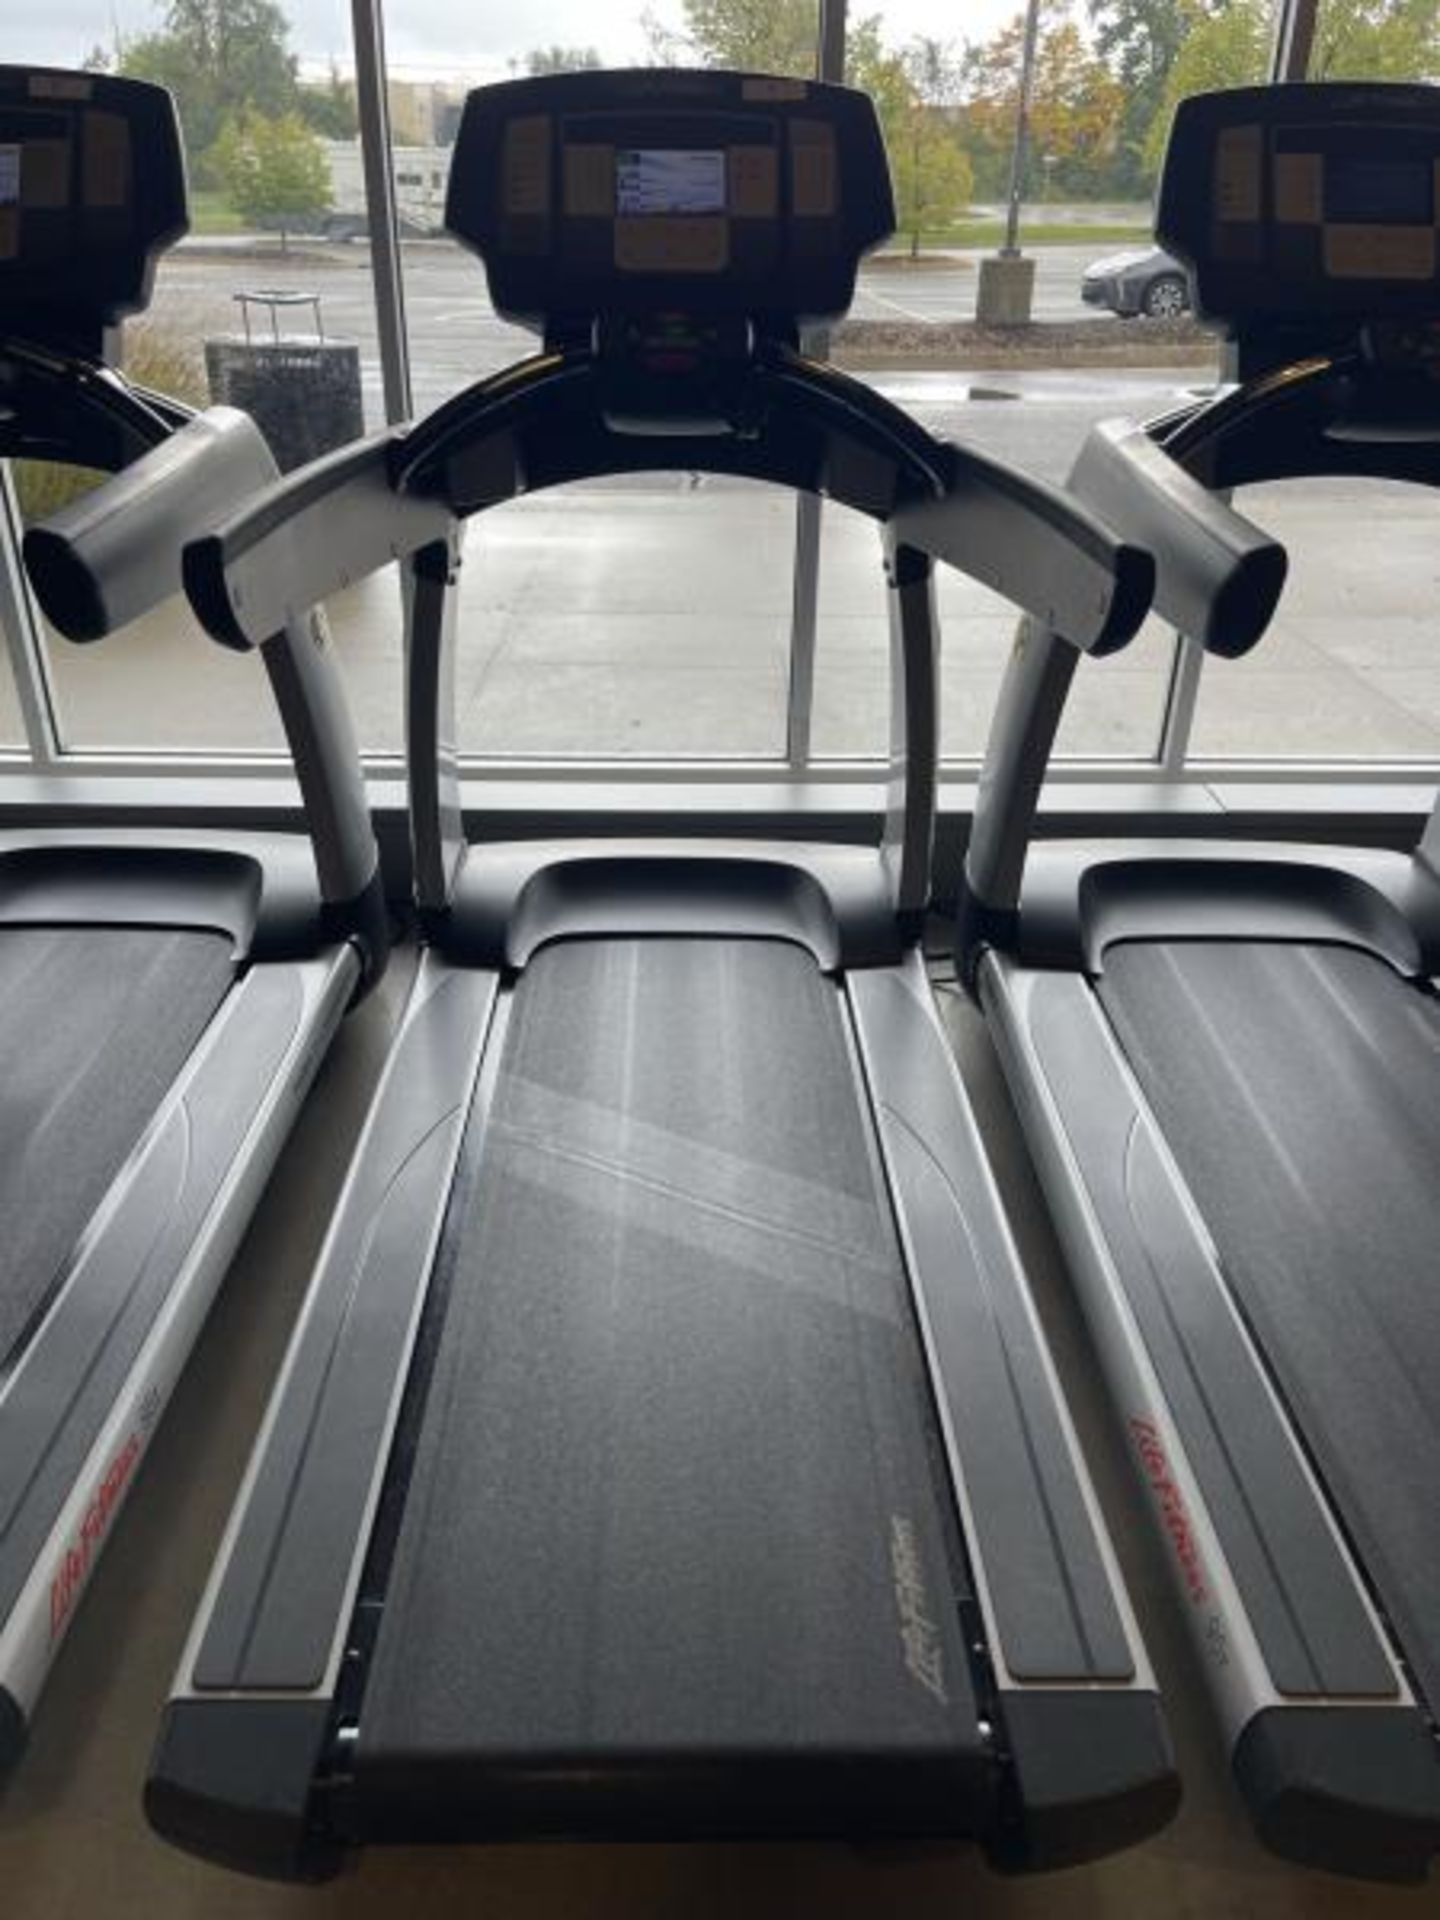 Life Fitness Treadmill M: 95T with Flex Deck, Shock Absorption System SN: TET106305